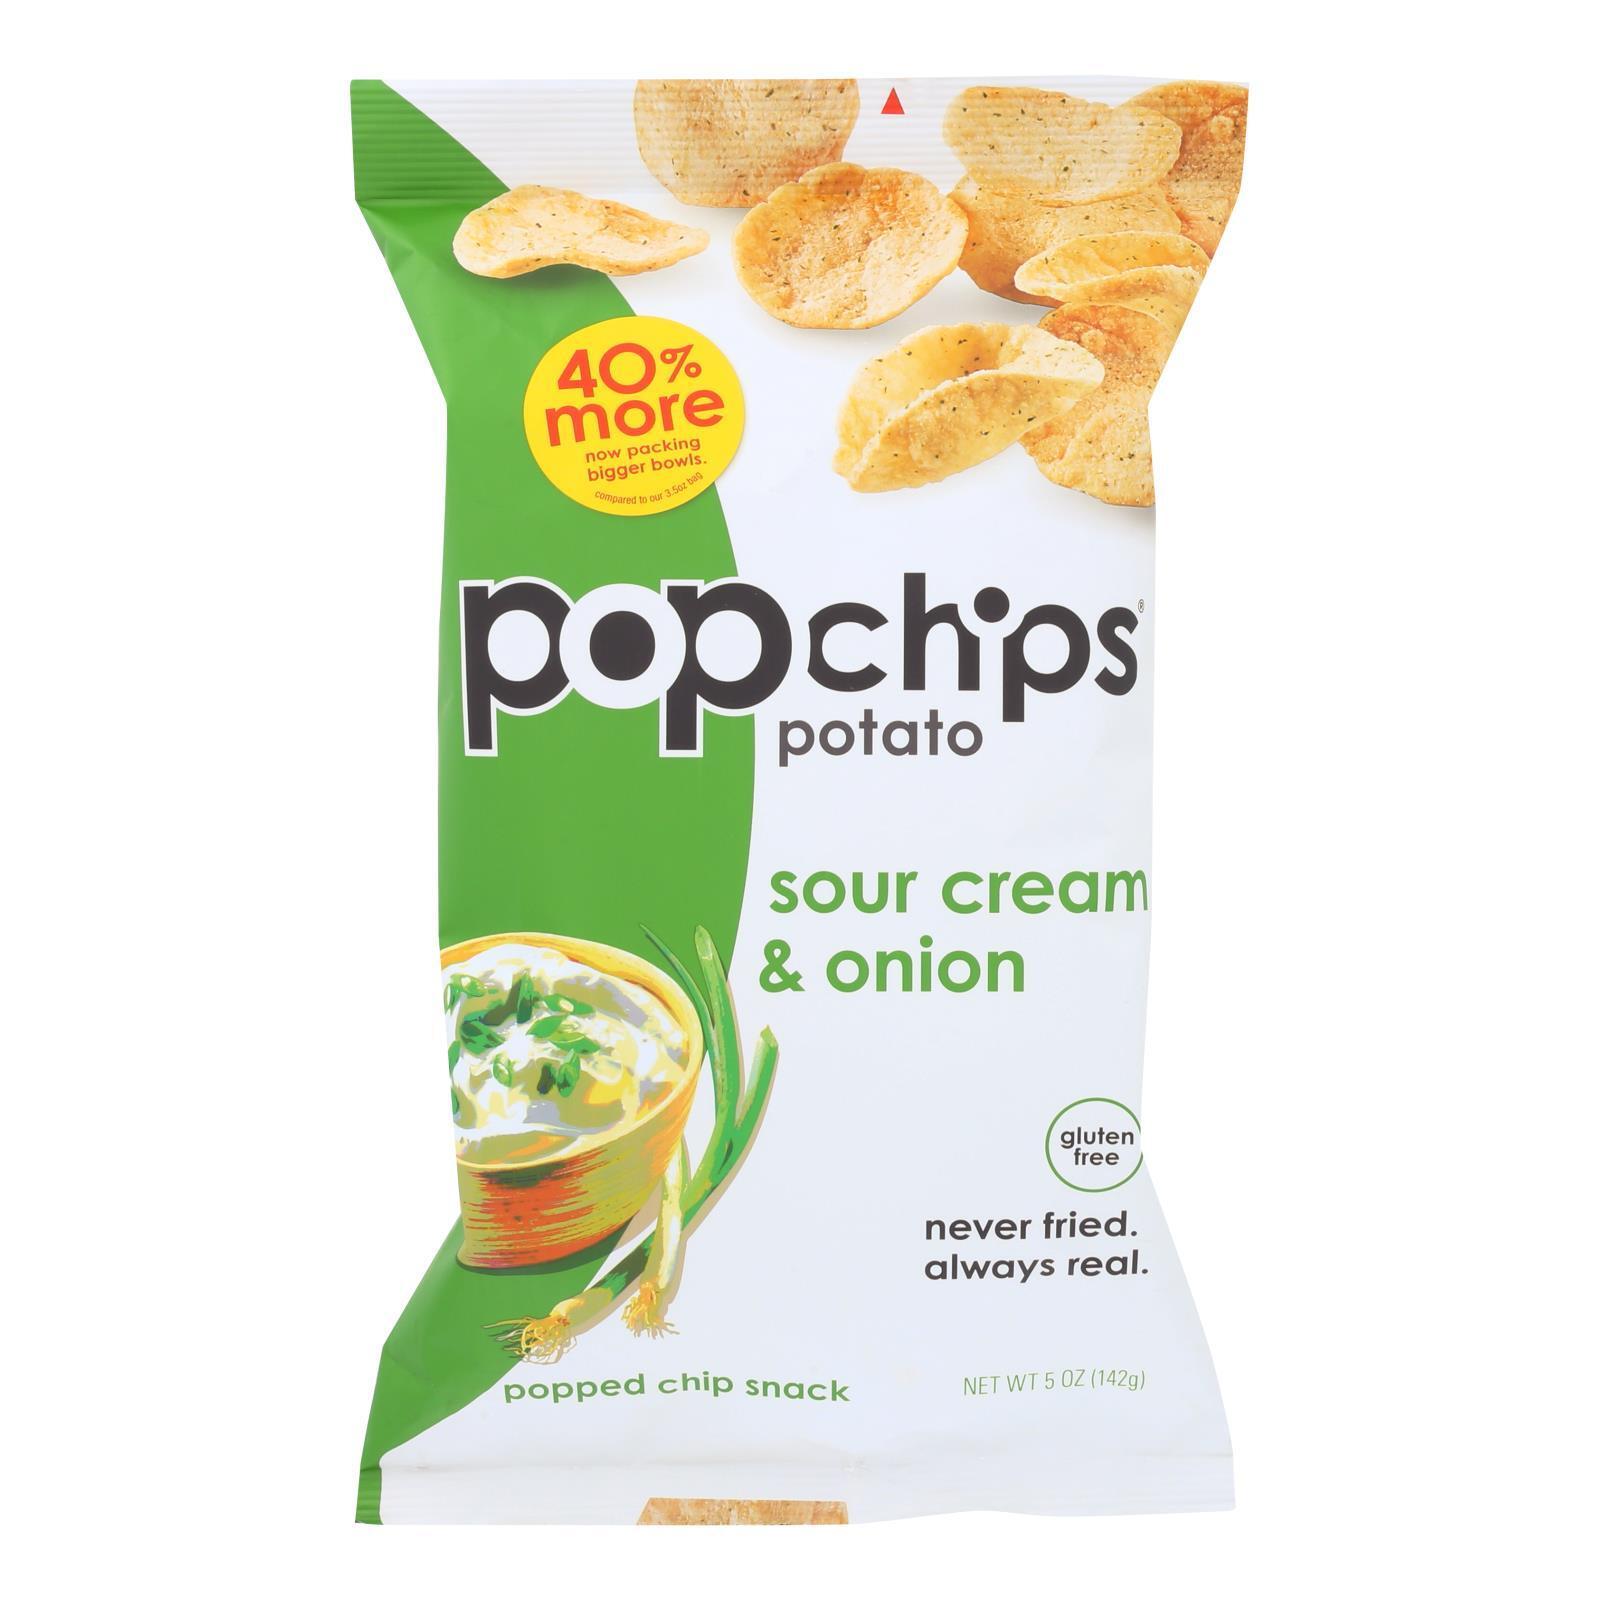 Popchips Potato Chip - Sour Cream - Onion - Case of 12 - 5 oz